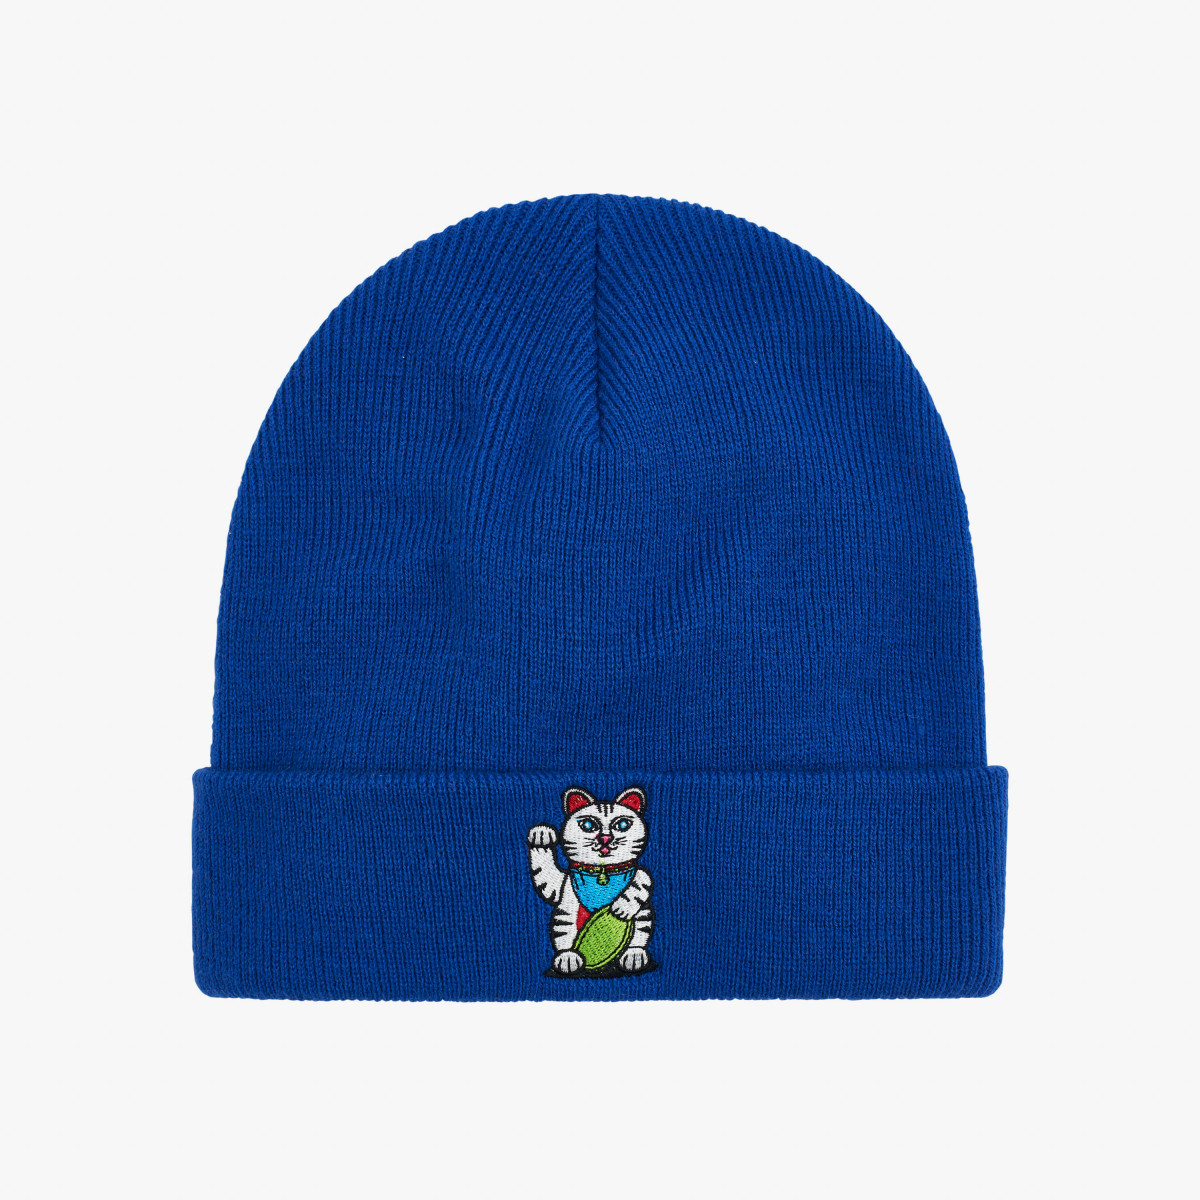 CAP BASIC PATCH BLUE PROFONDO